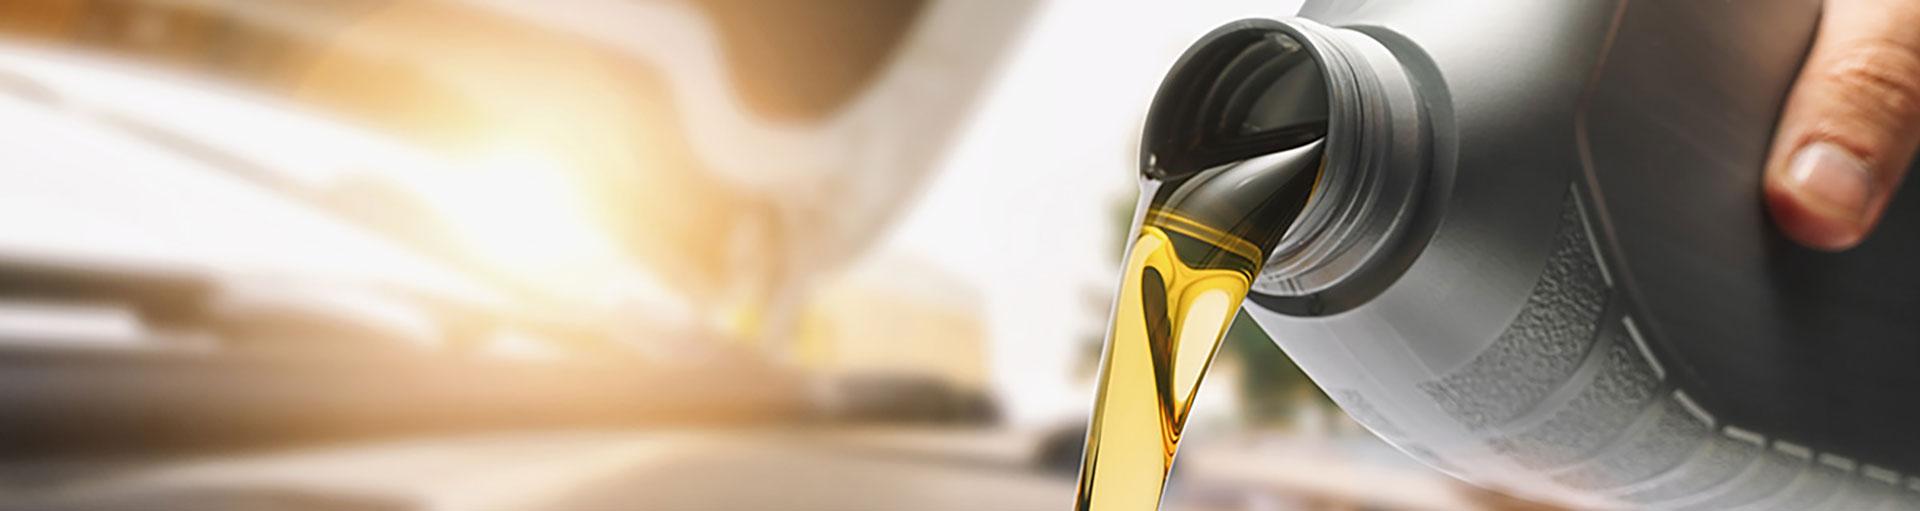 Porter Nissan Oil Change Services